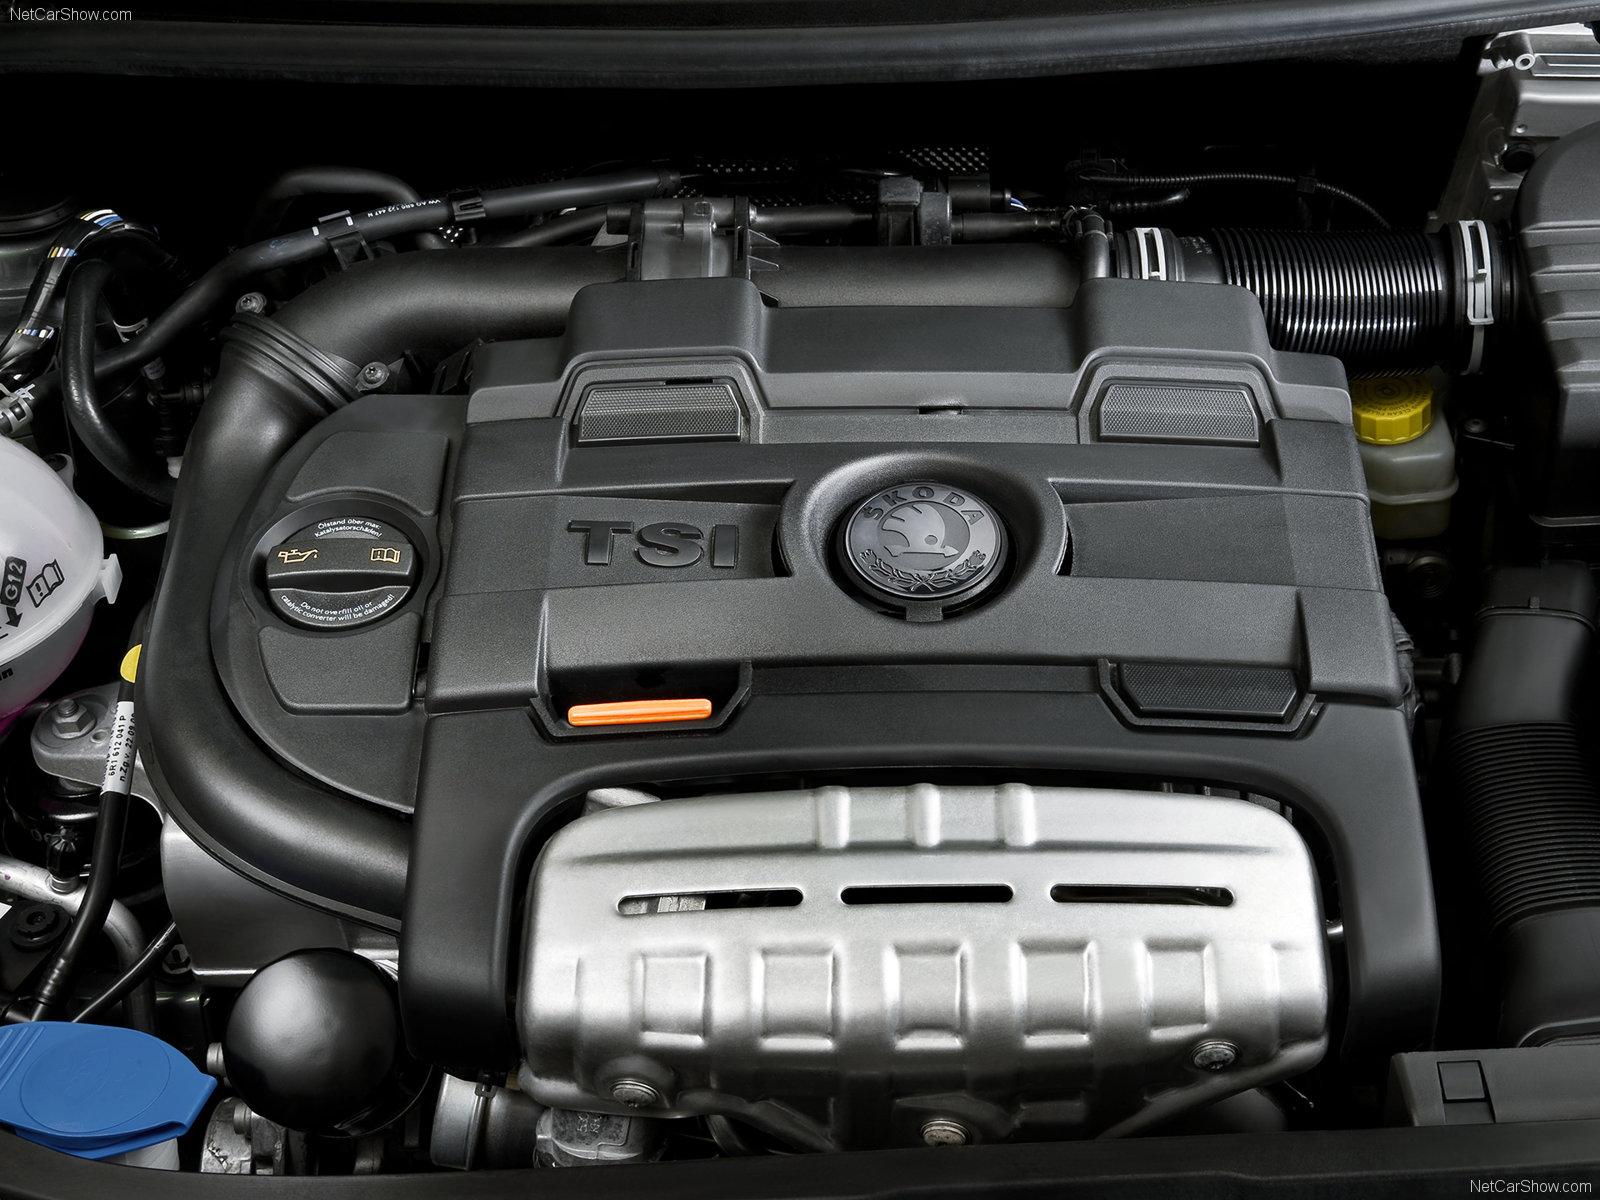 Skoda Fabia motor